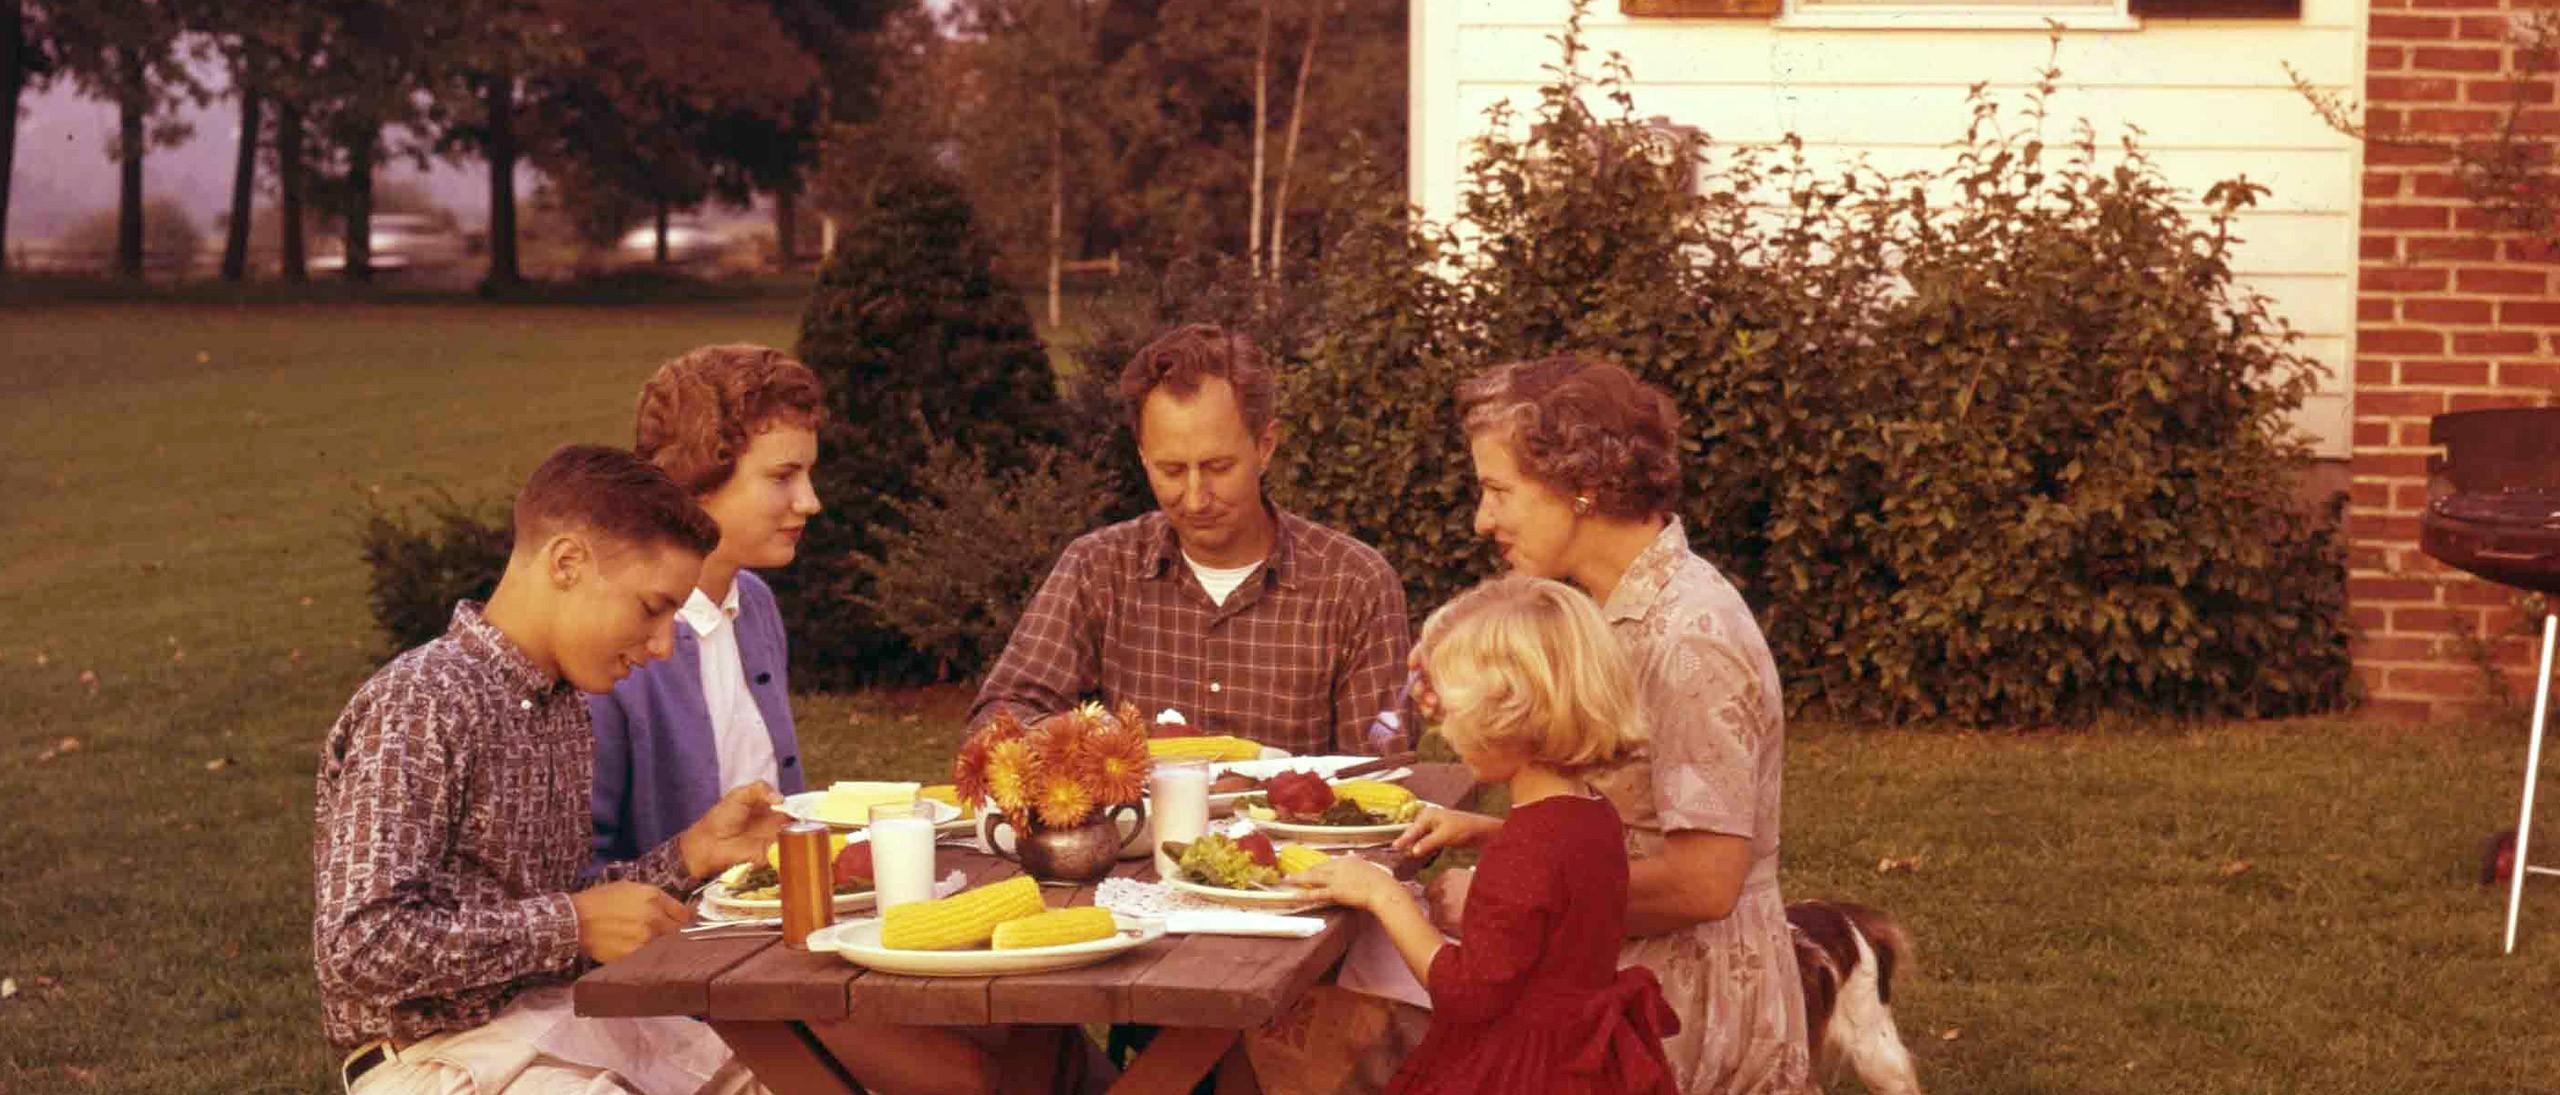 The Farnham family in their Mendham, New Jersey garden, 1960s